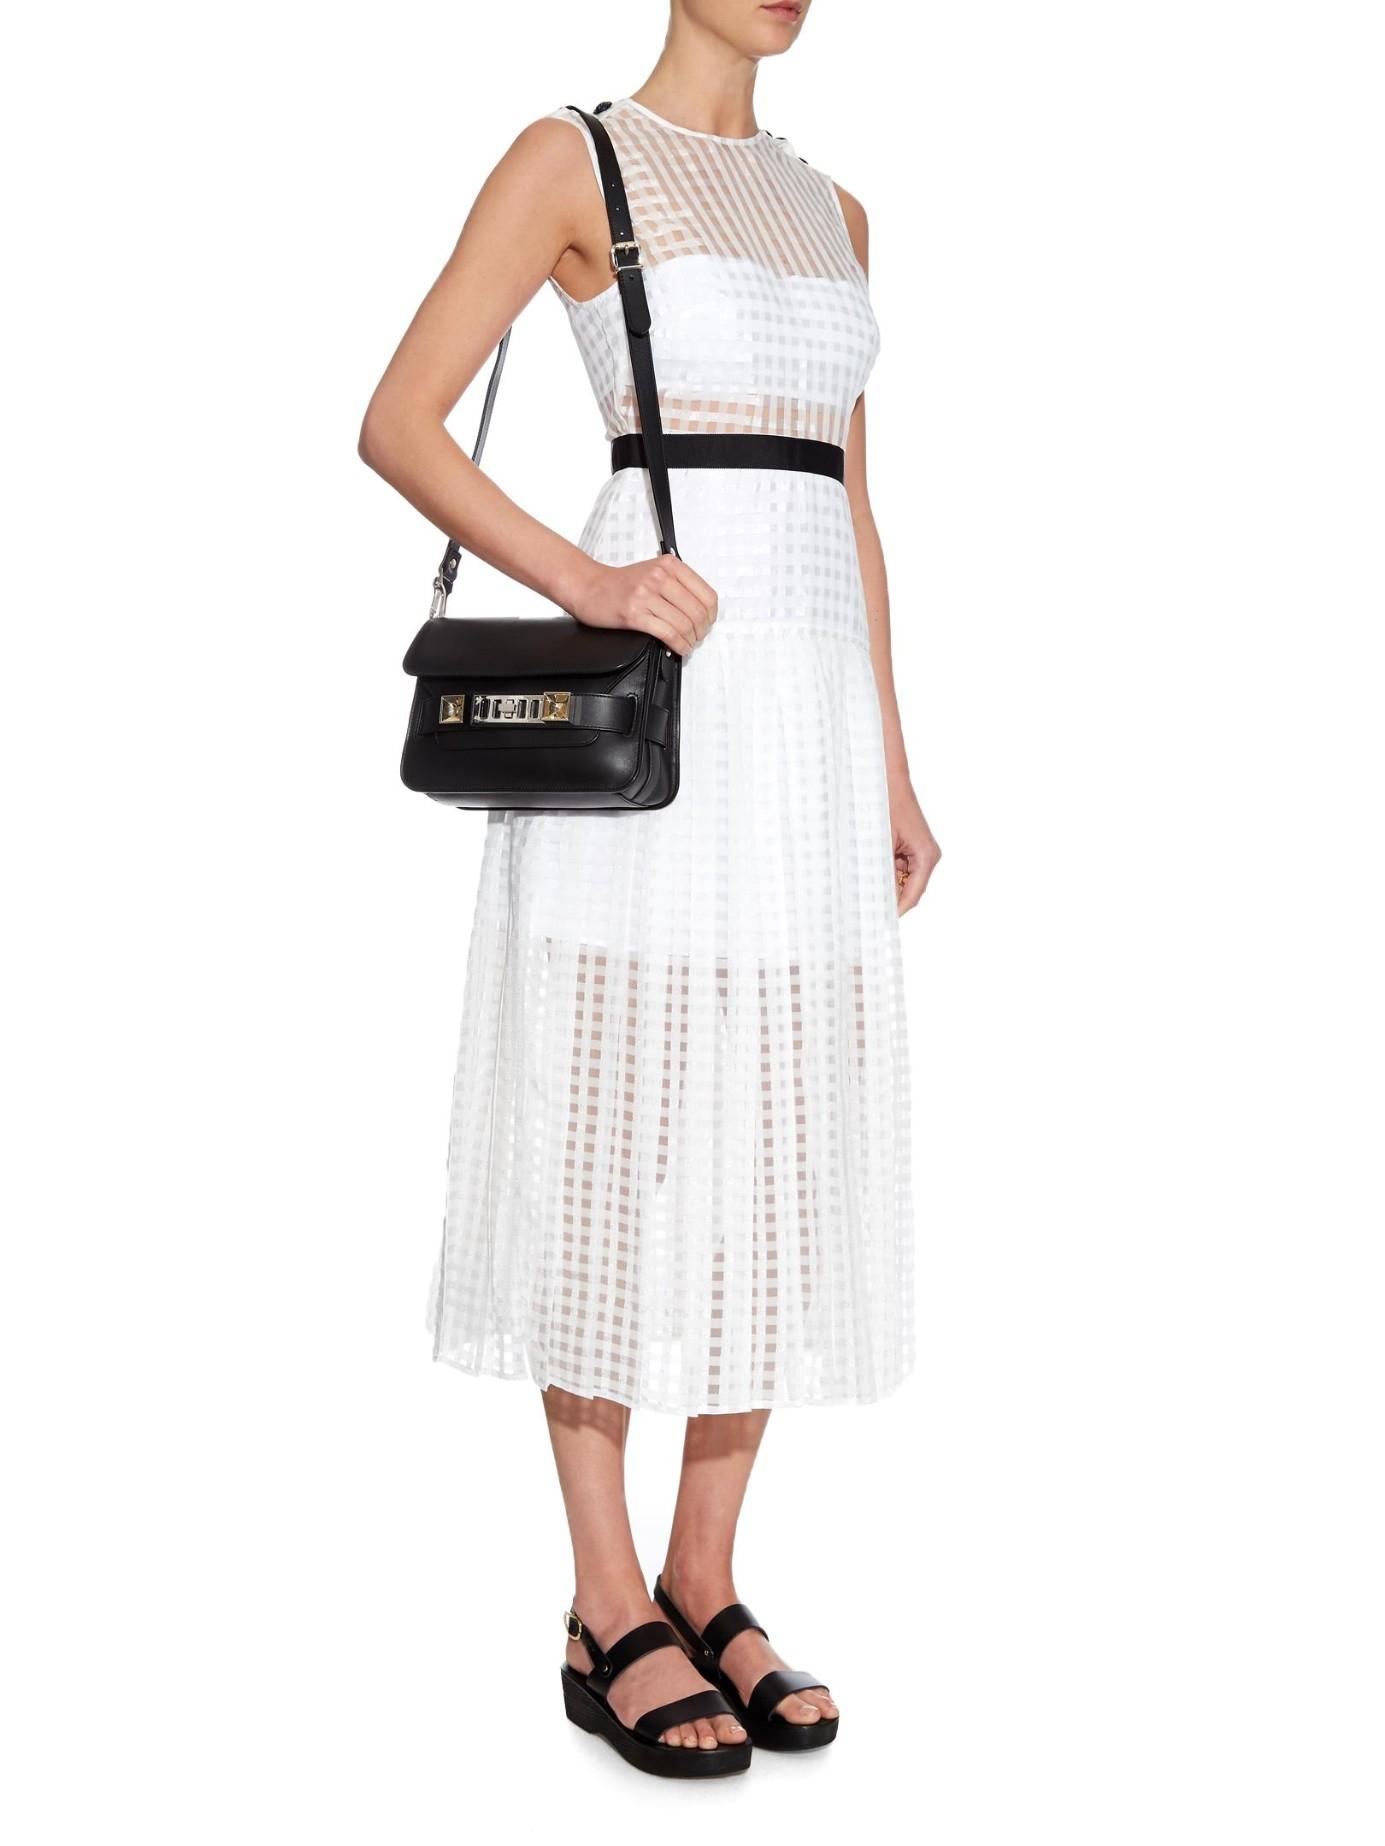 8e484b59cd8c Self-Portrait Monochrome Pleated Mini Dress in White - Lyst